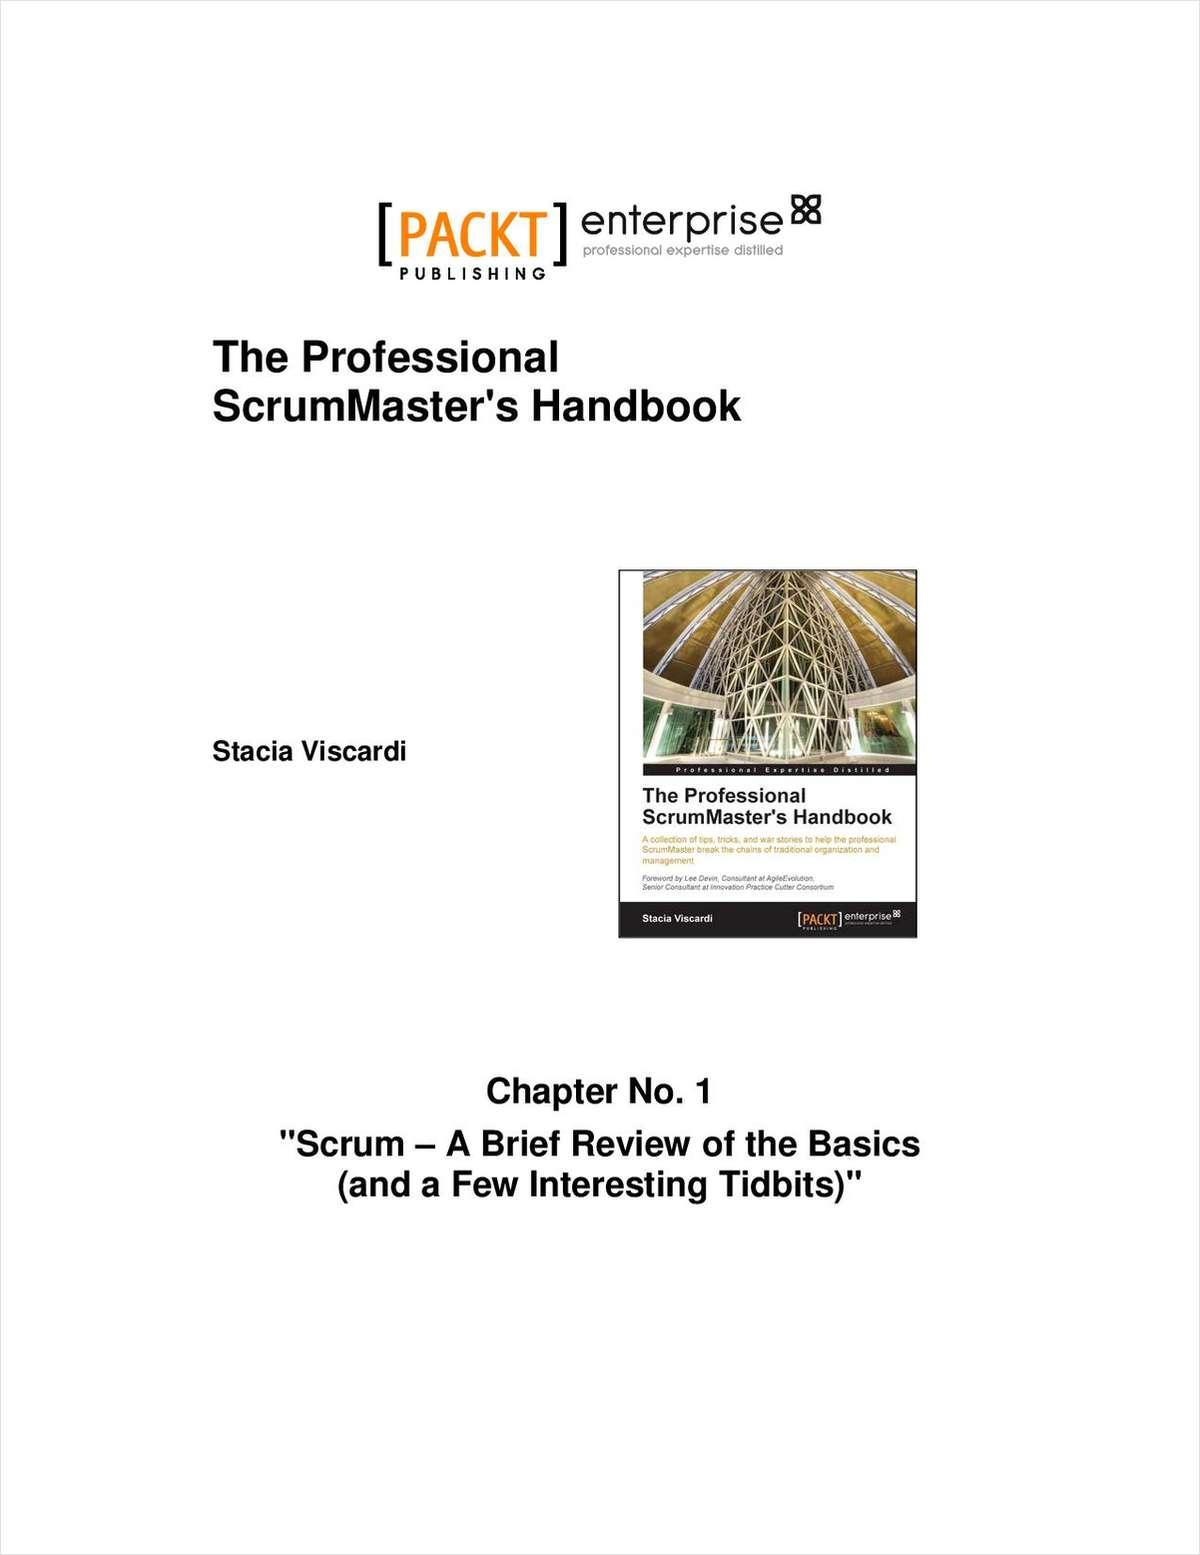 The Professional ScrumMaster's Handbook--Free 30 Page Excerpt